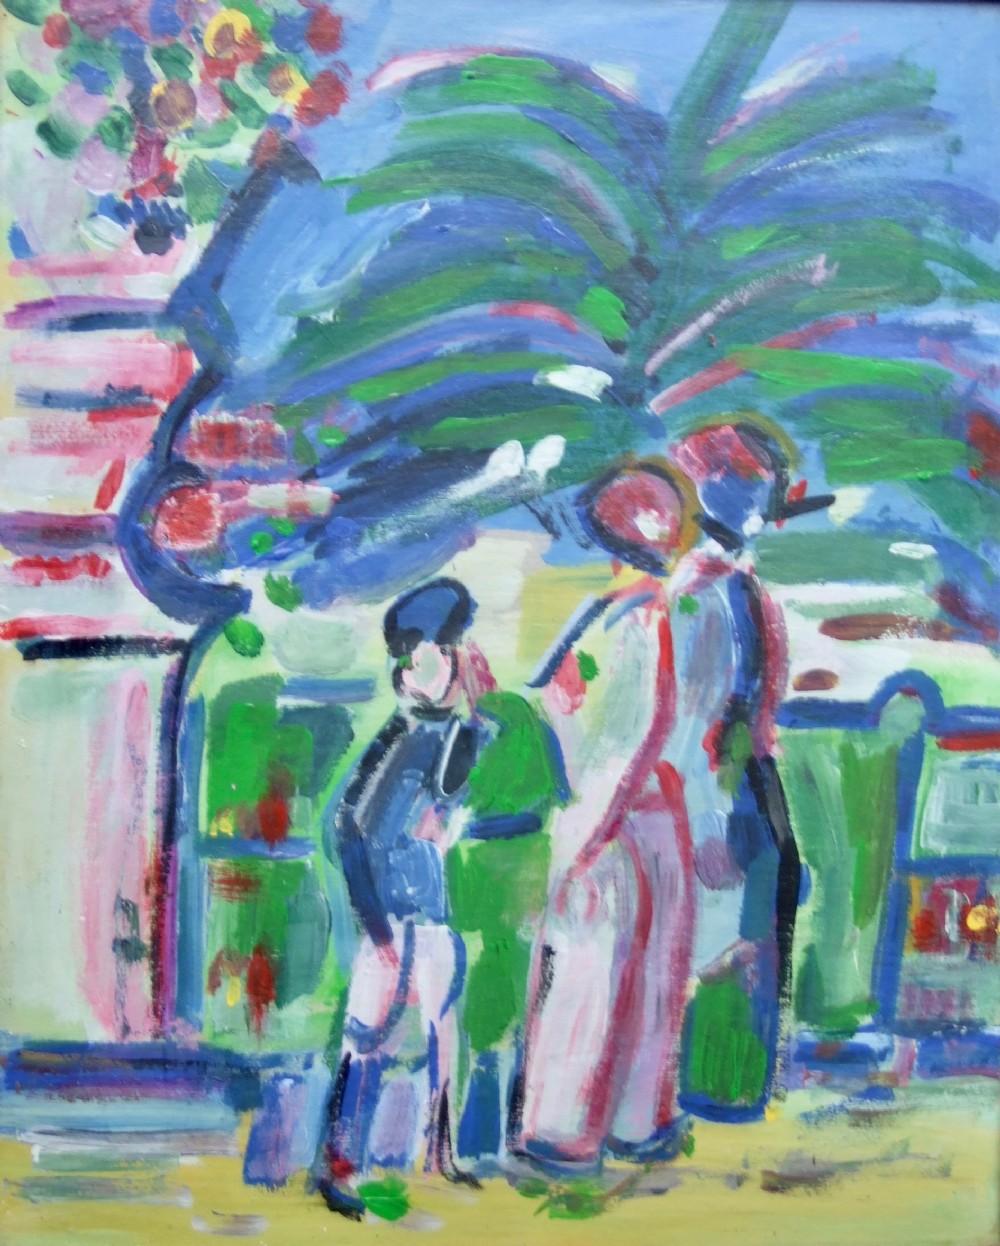 scottish colourist style painting